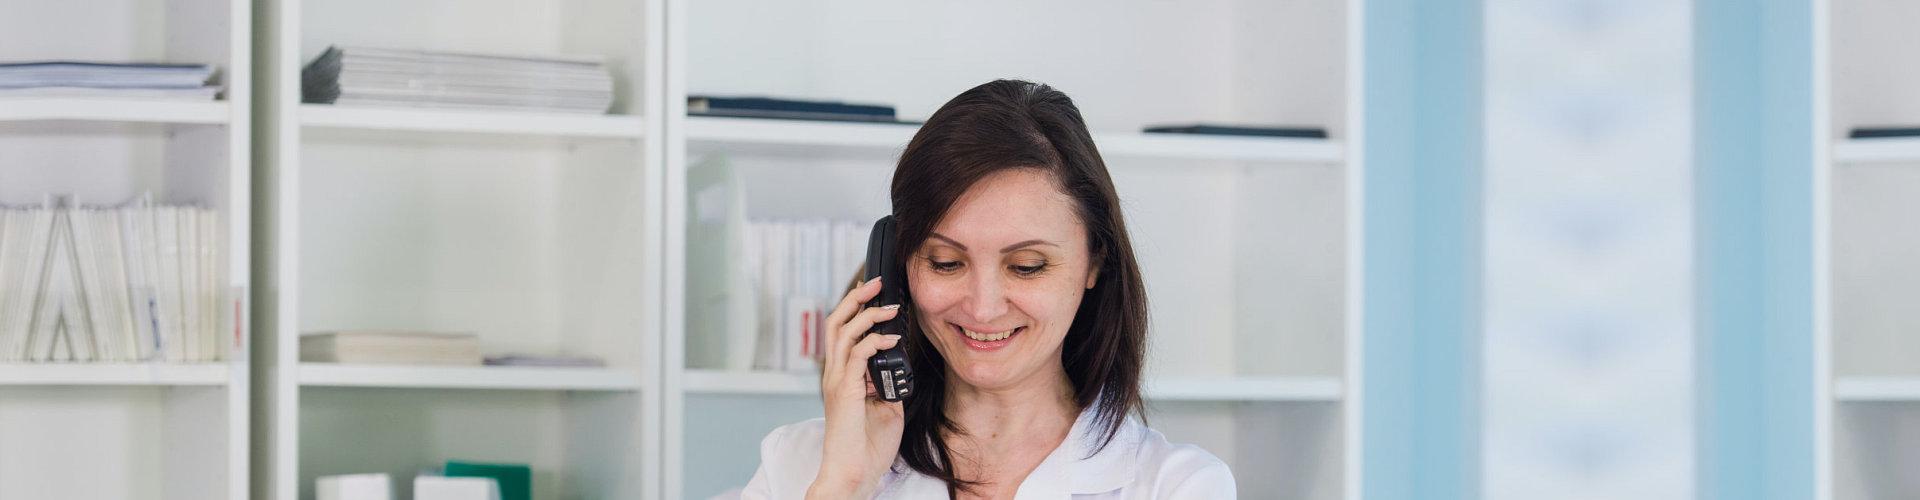 smiling woman taking phone call